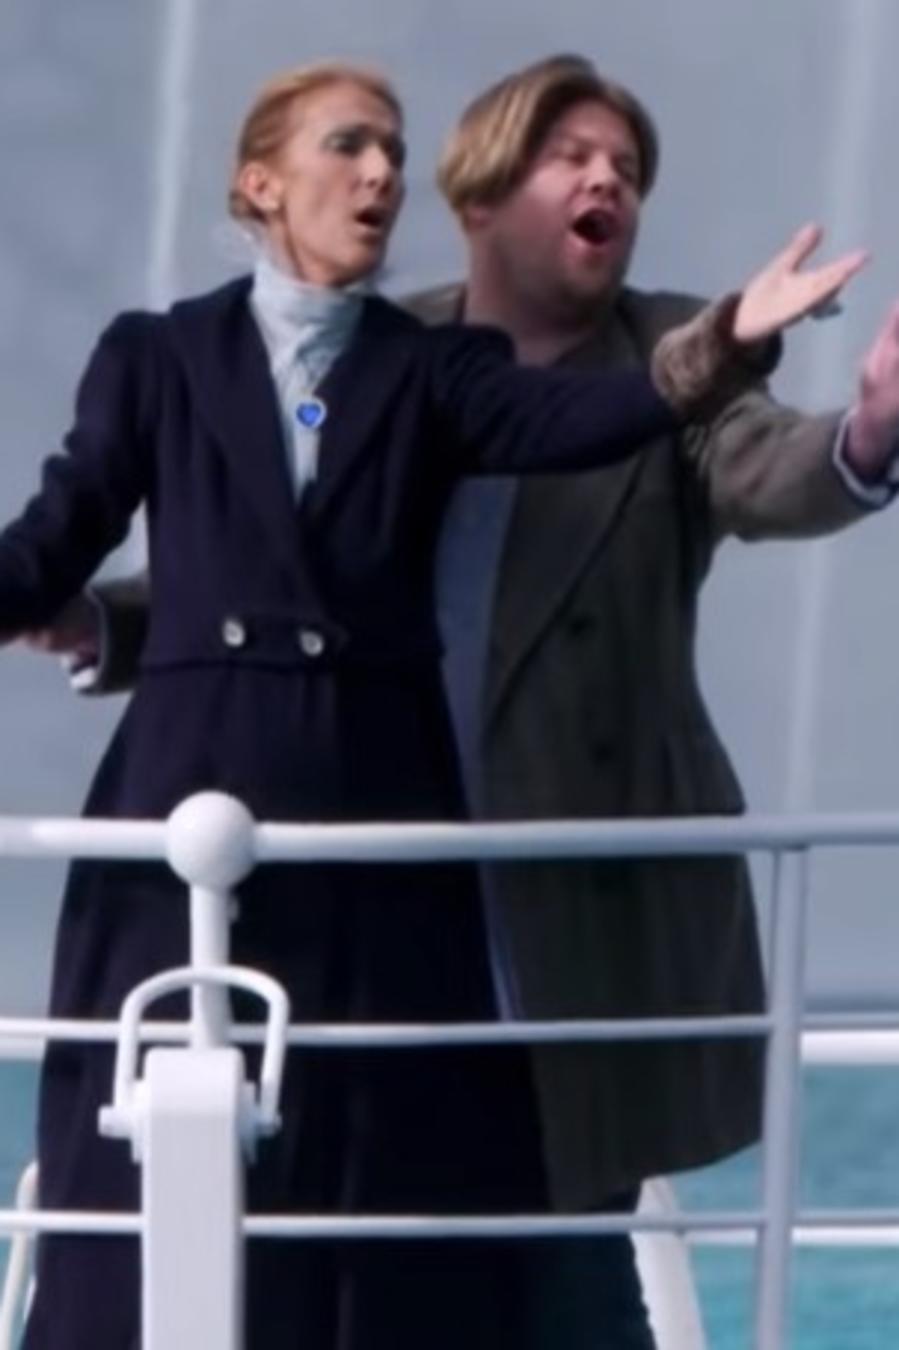 Celine Dion recreates Titanic in Carpool Karaoke with James Corden